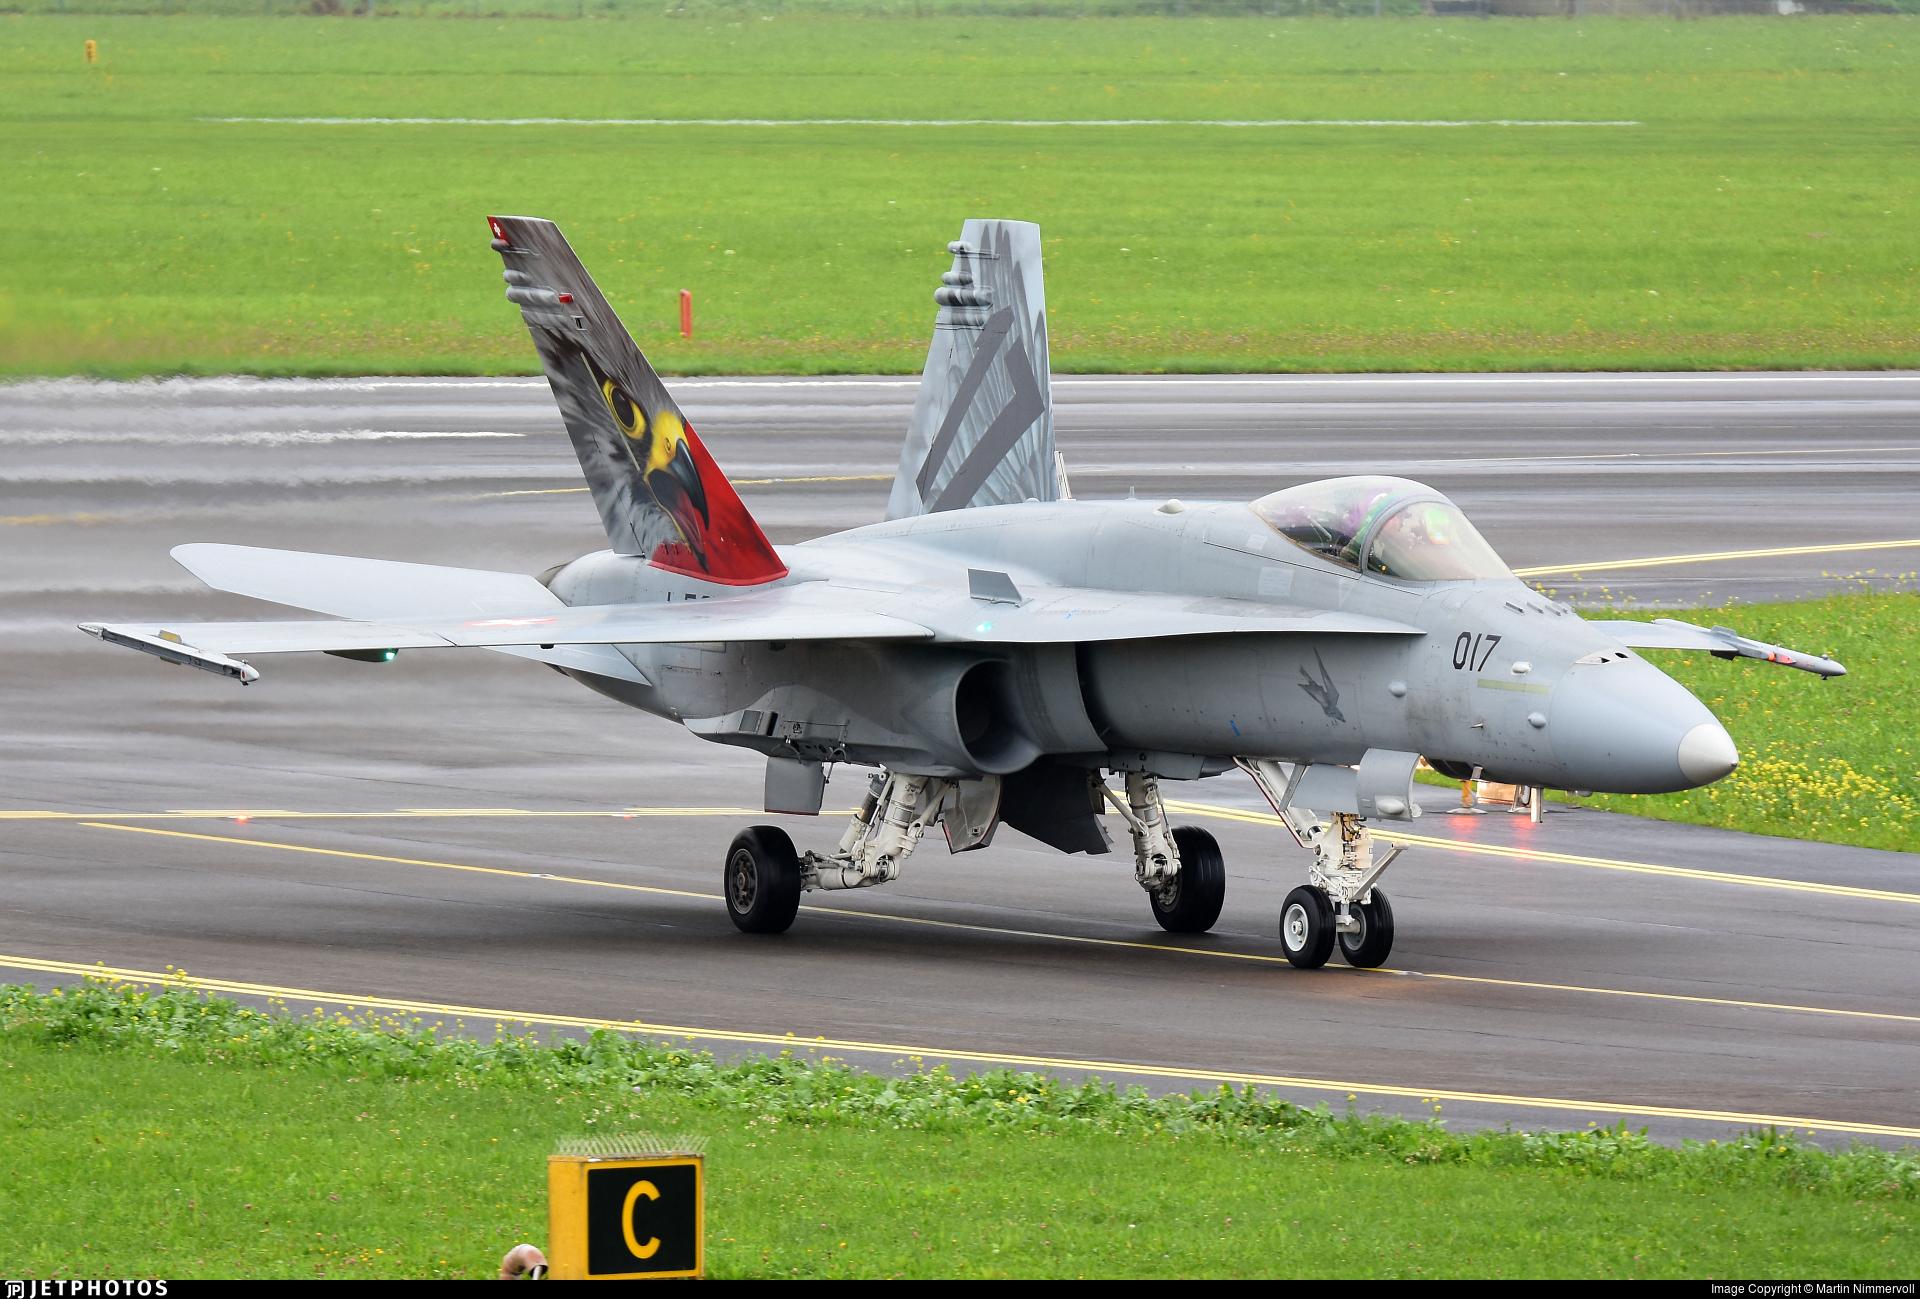 J-5017 - McDonnell Douglas F/A-18C Hornet - Switzerland - Air Force